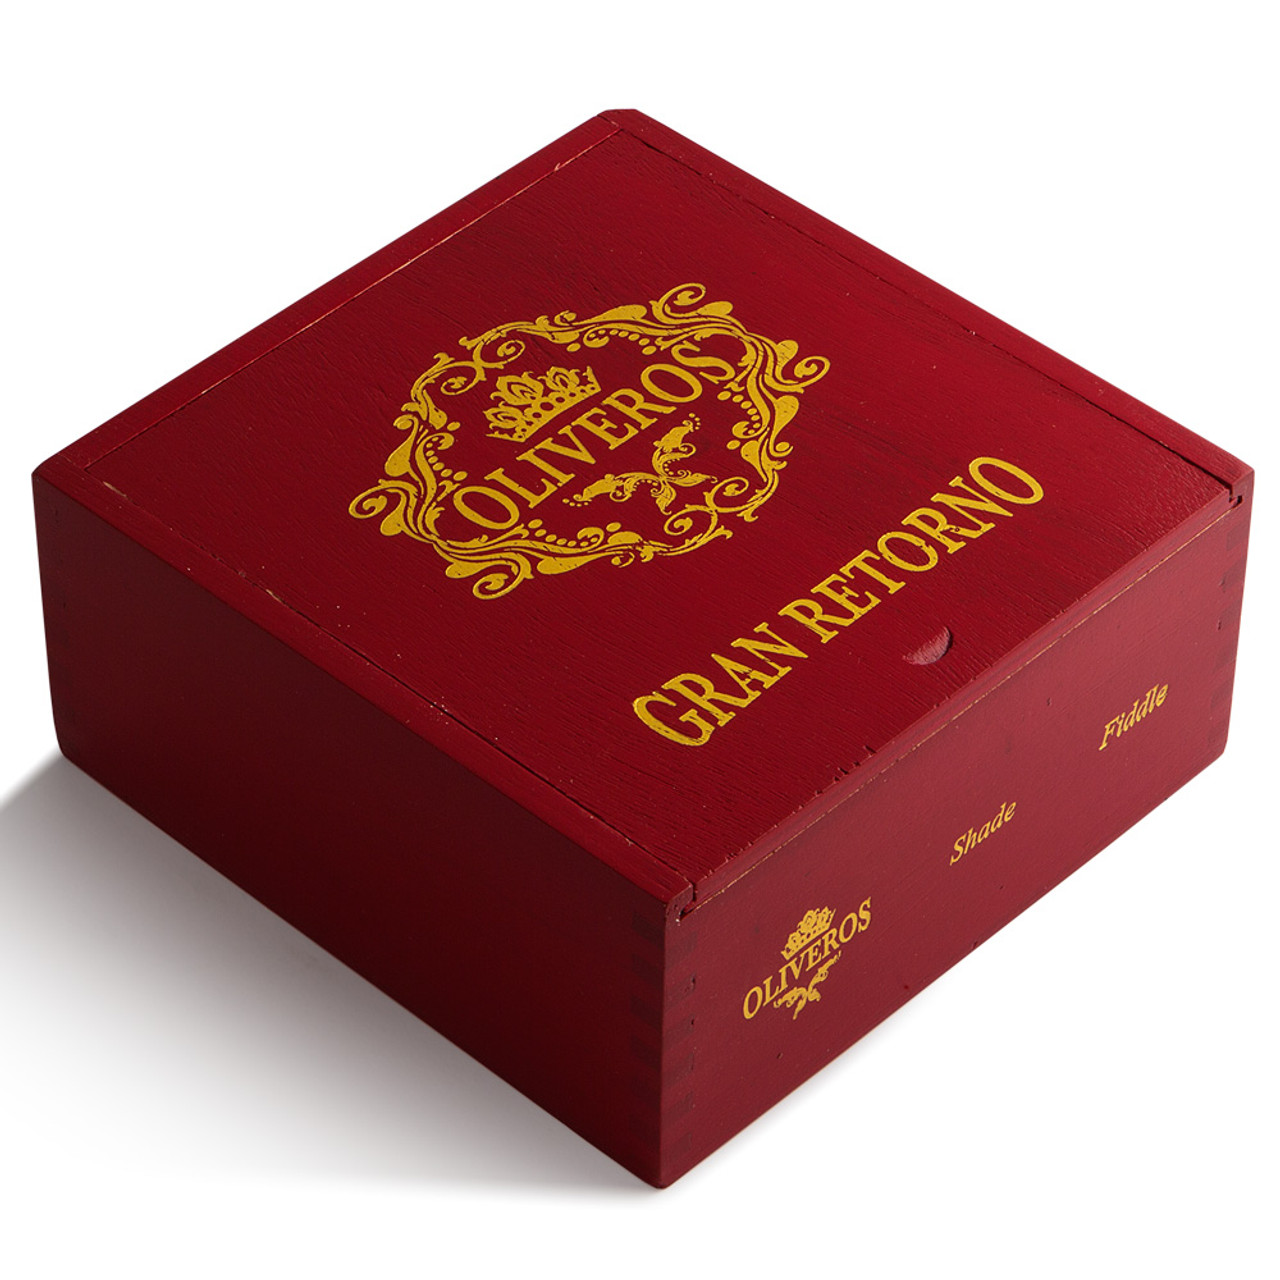 Oliveros Gran Retorno Connecticut Banjo Cigars - 4.5 x 52 (Box of 20)